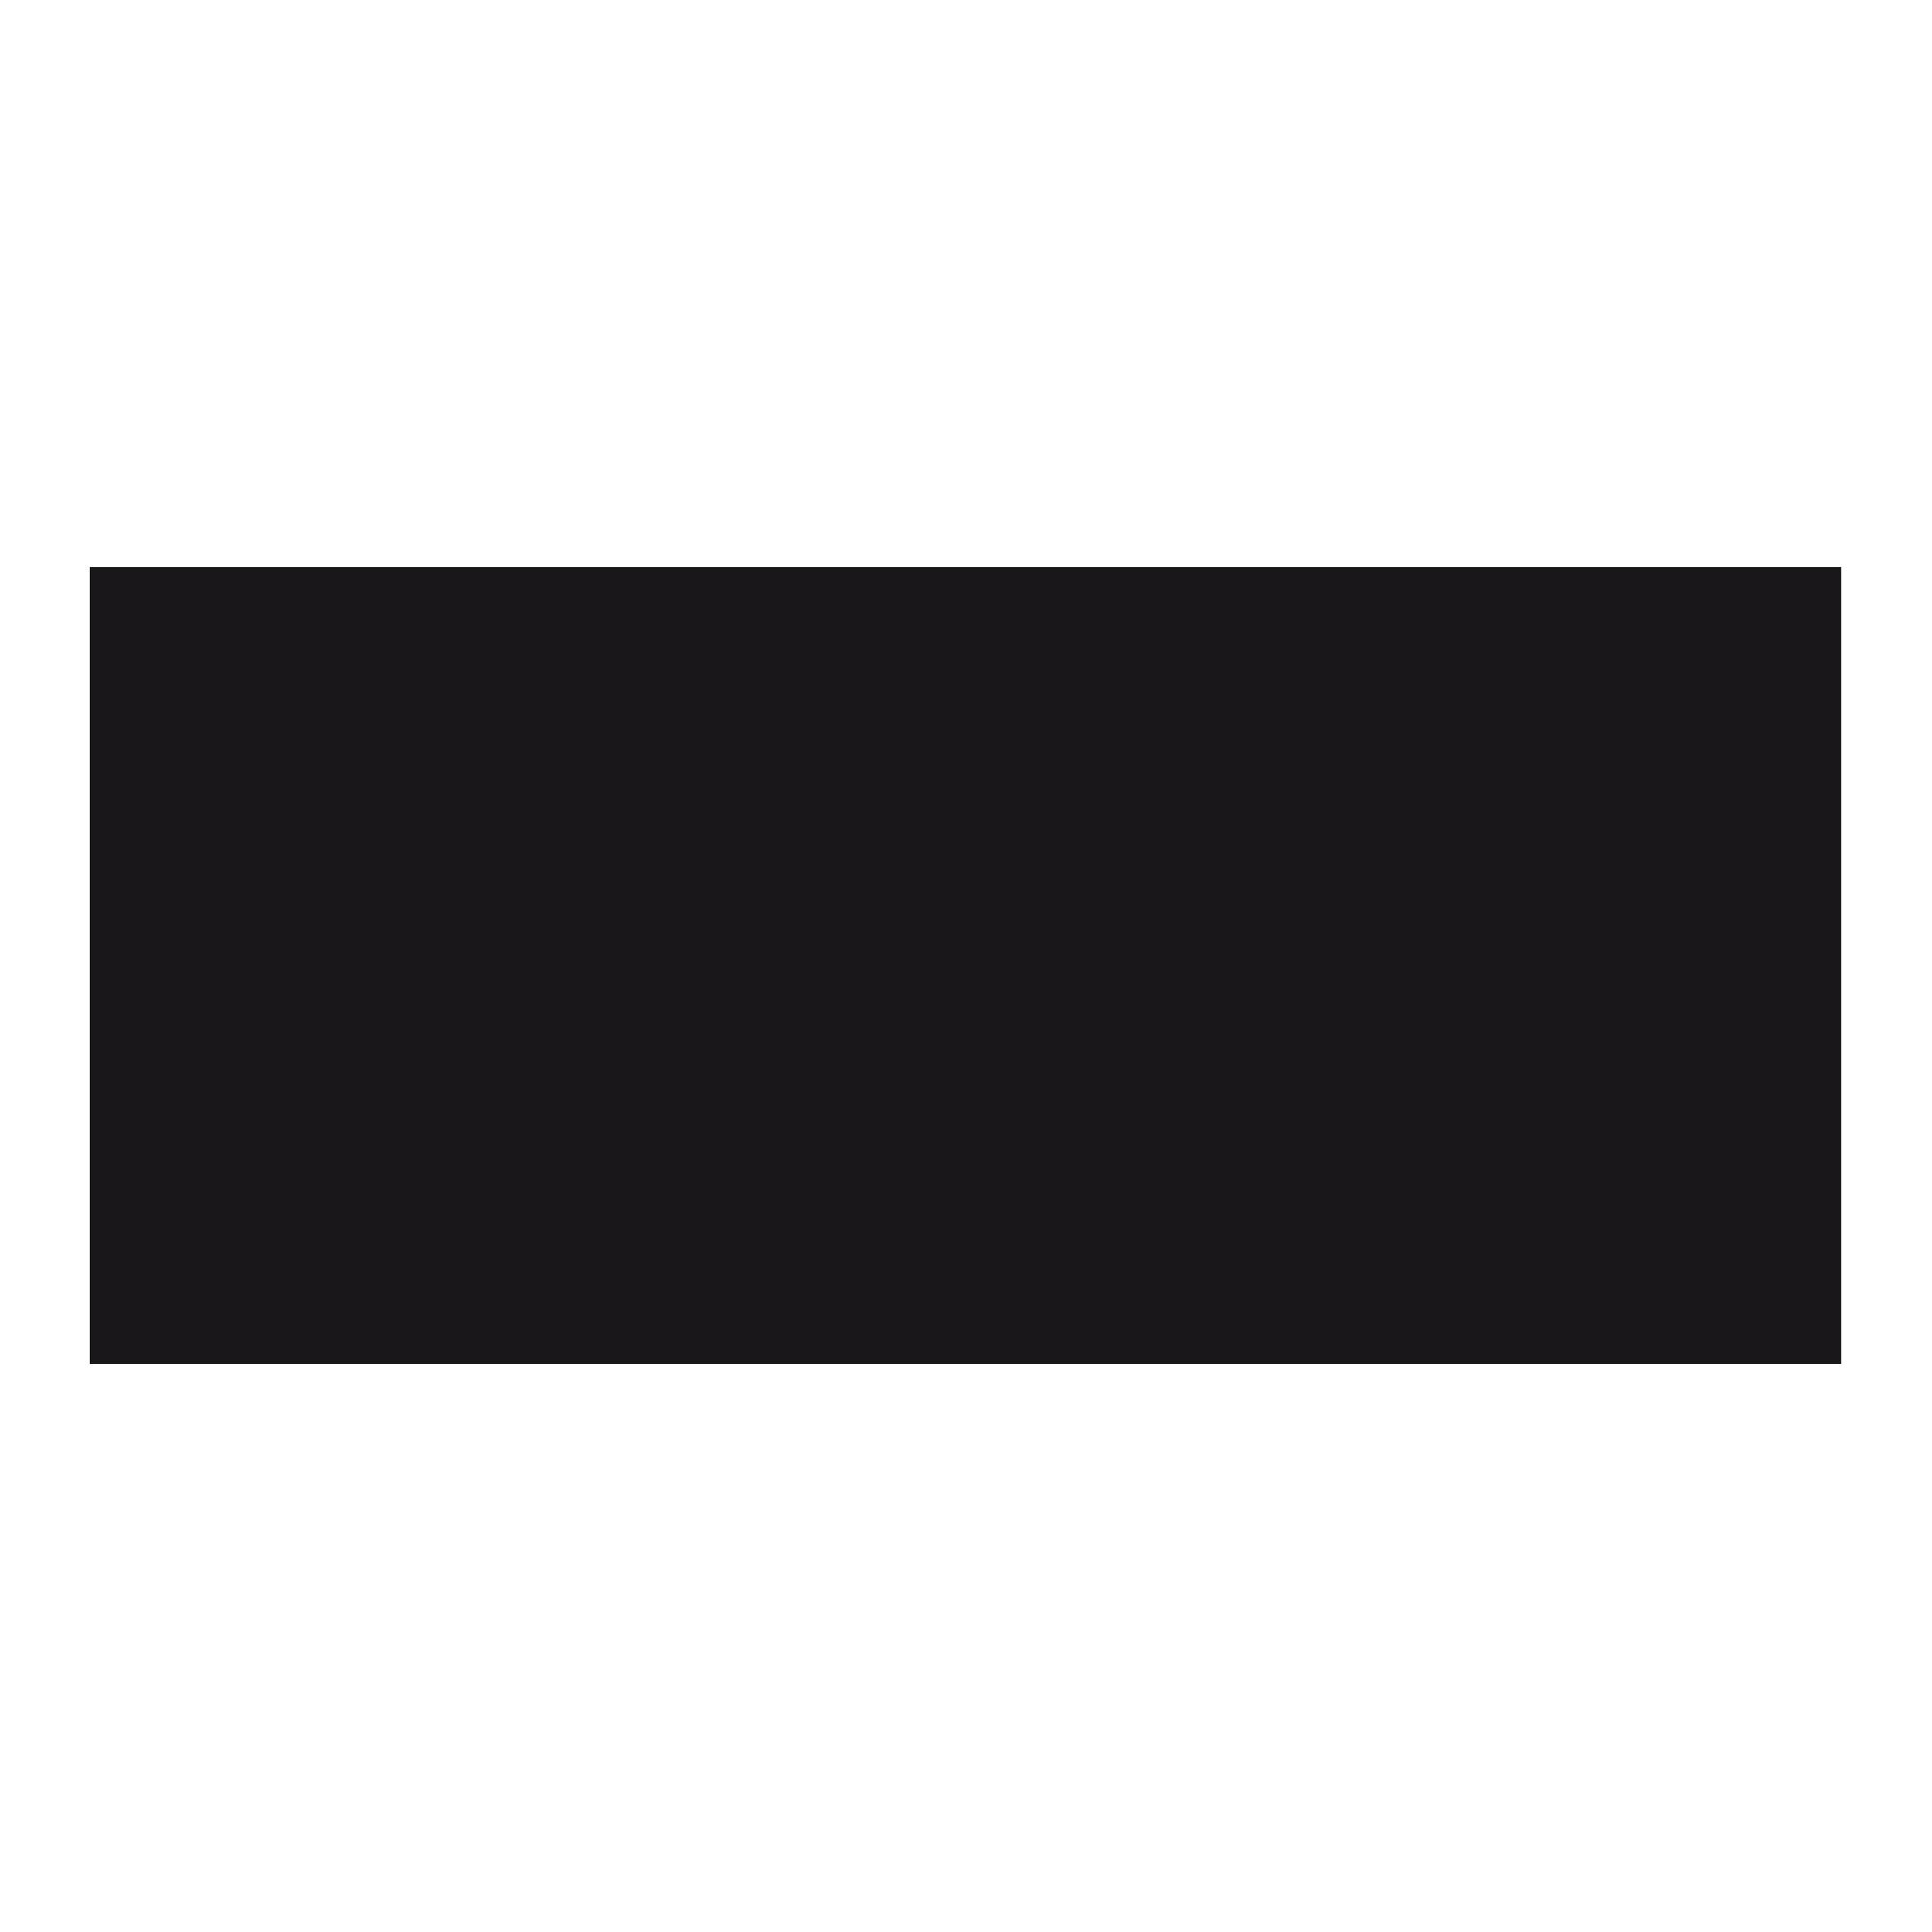 Ohnly_Logo_mit_Claim_black_L